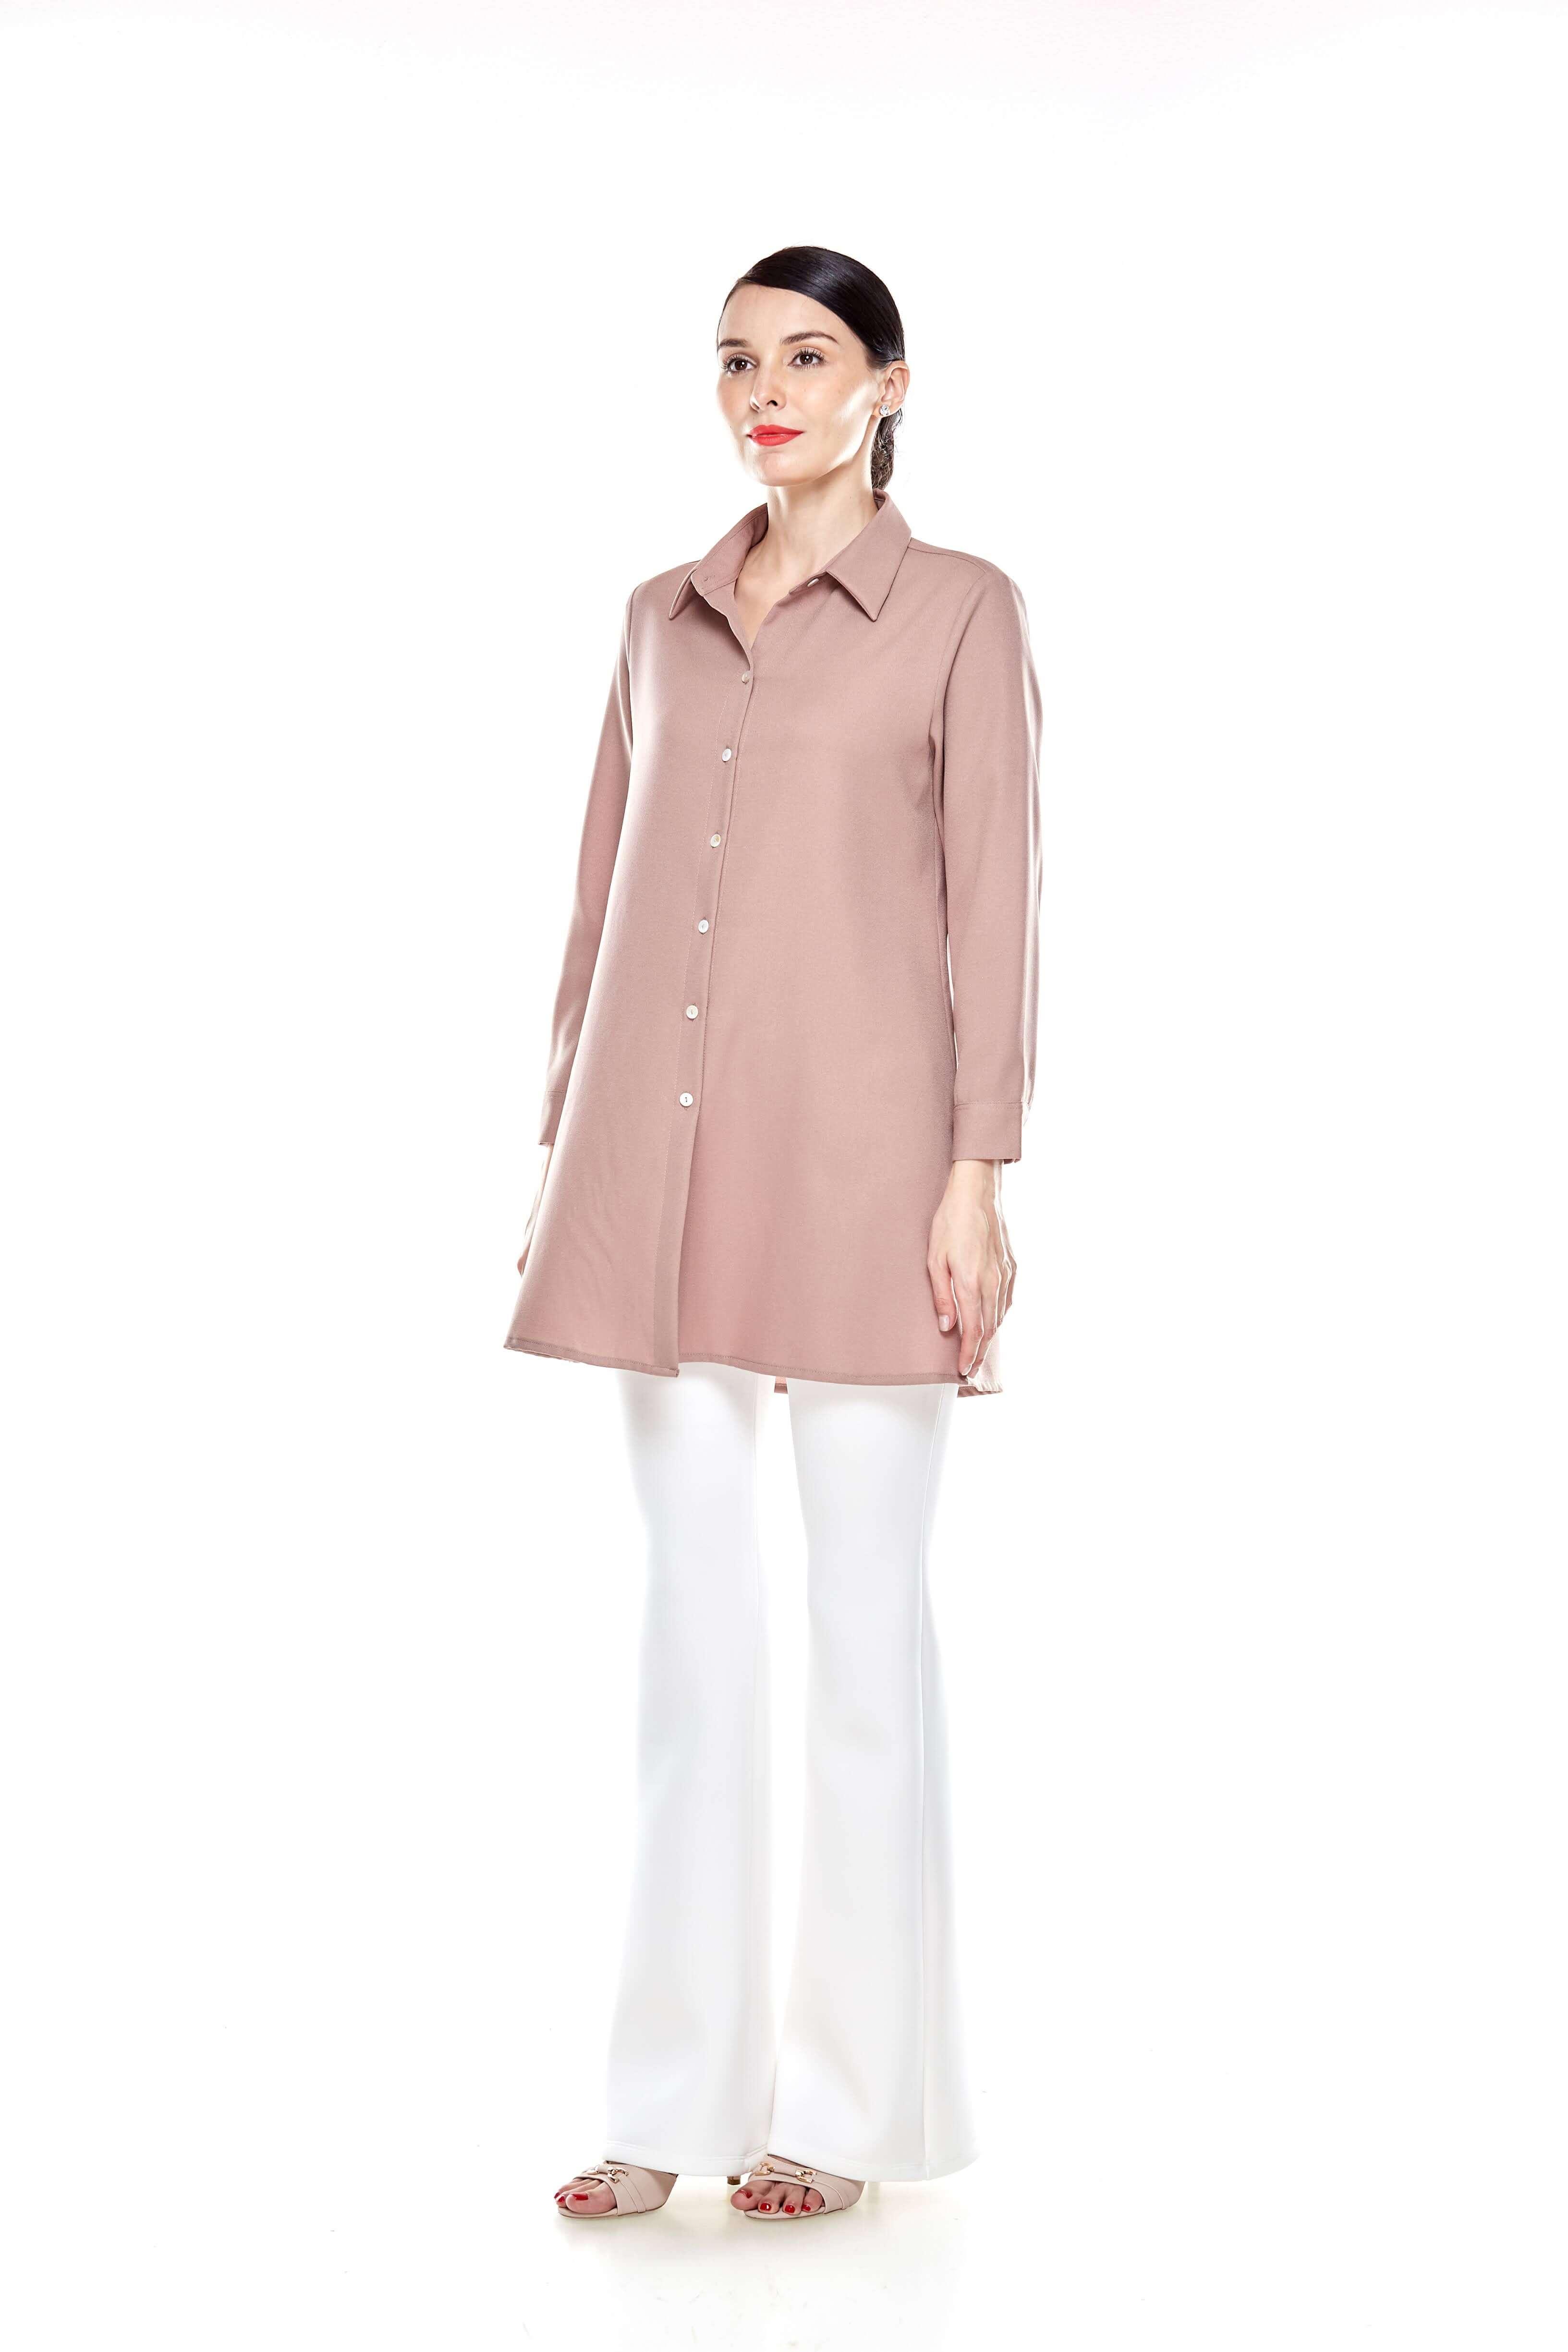 Warm Taupe Shirt Blouse (3)